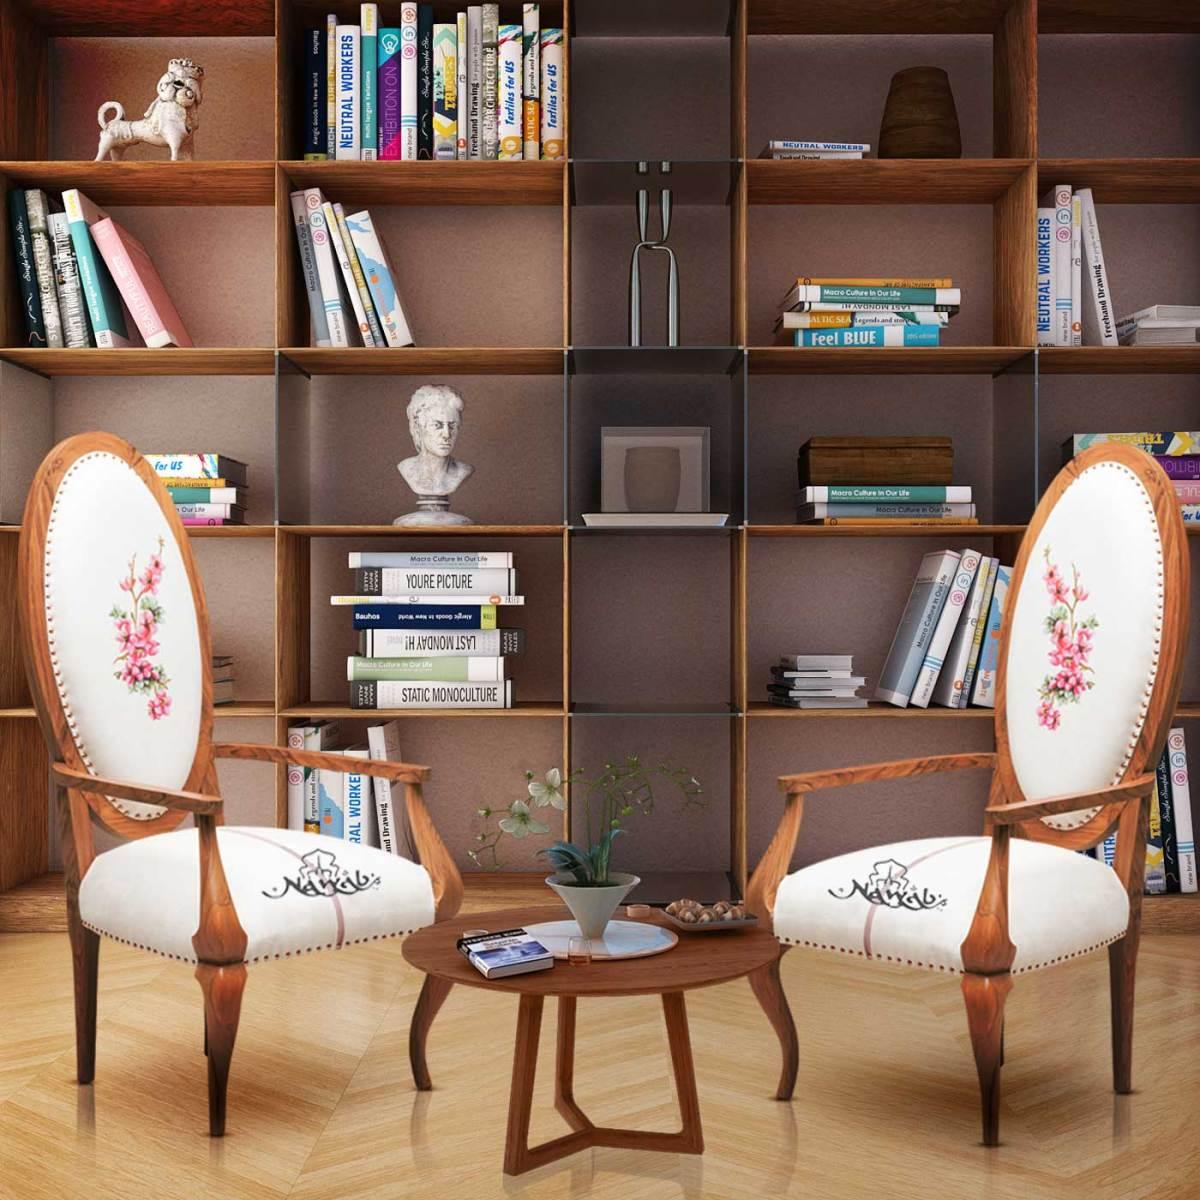 teak-mat-polish-solid-wooden-teak-suede--fabric-background